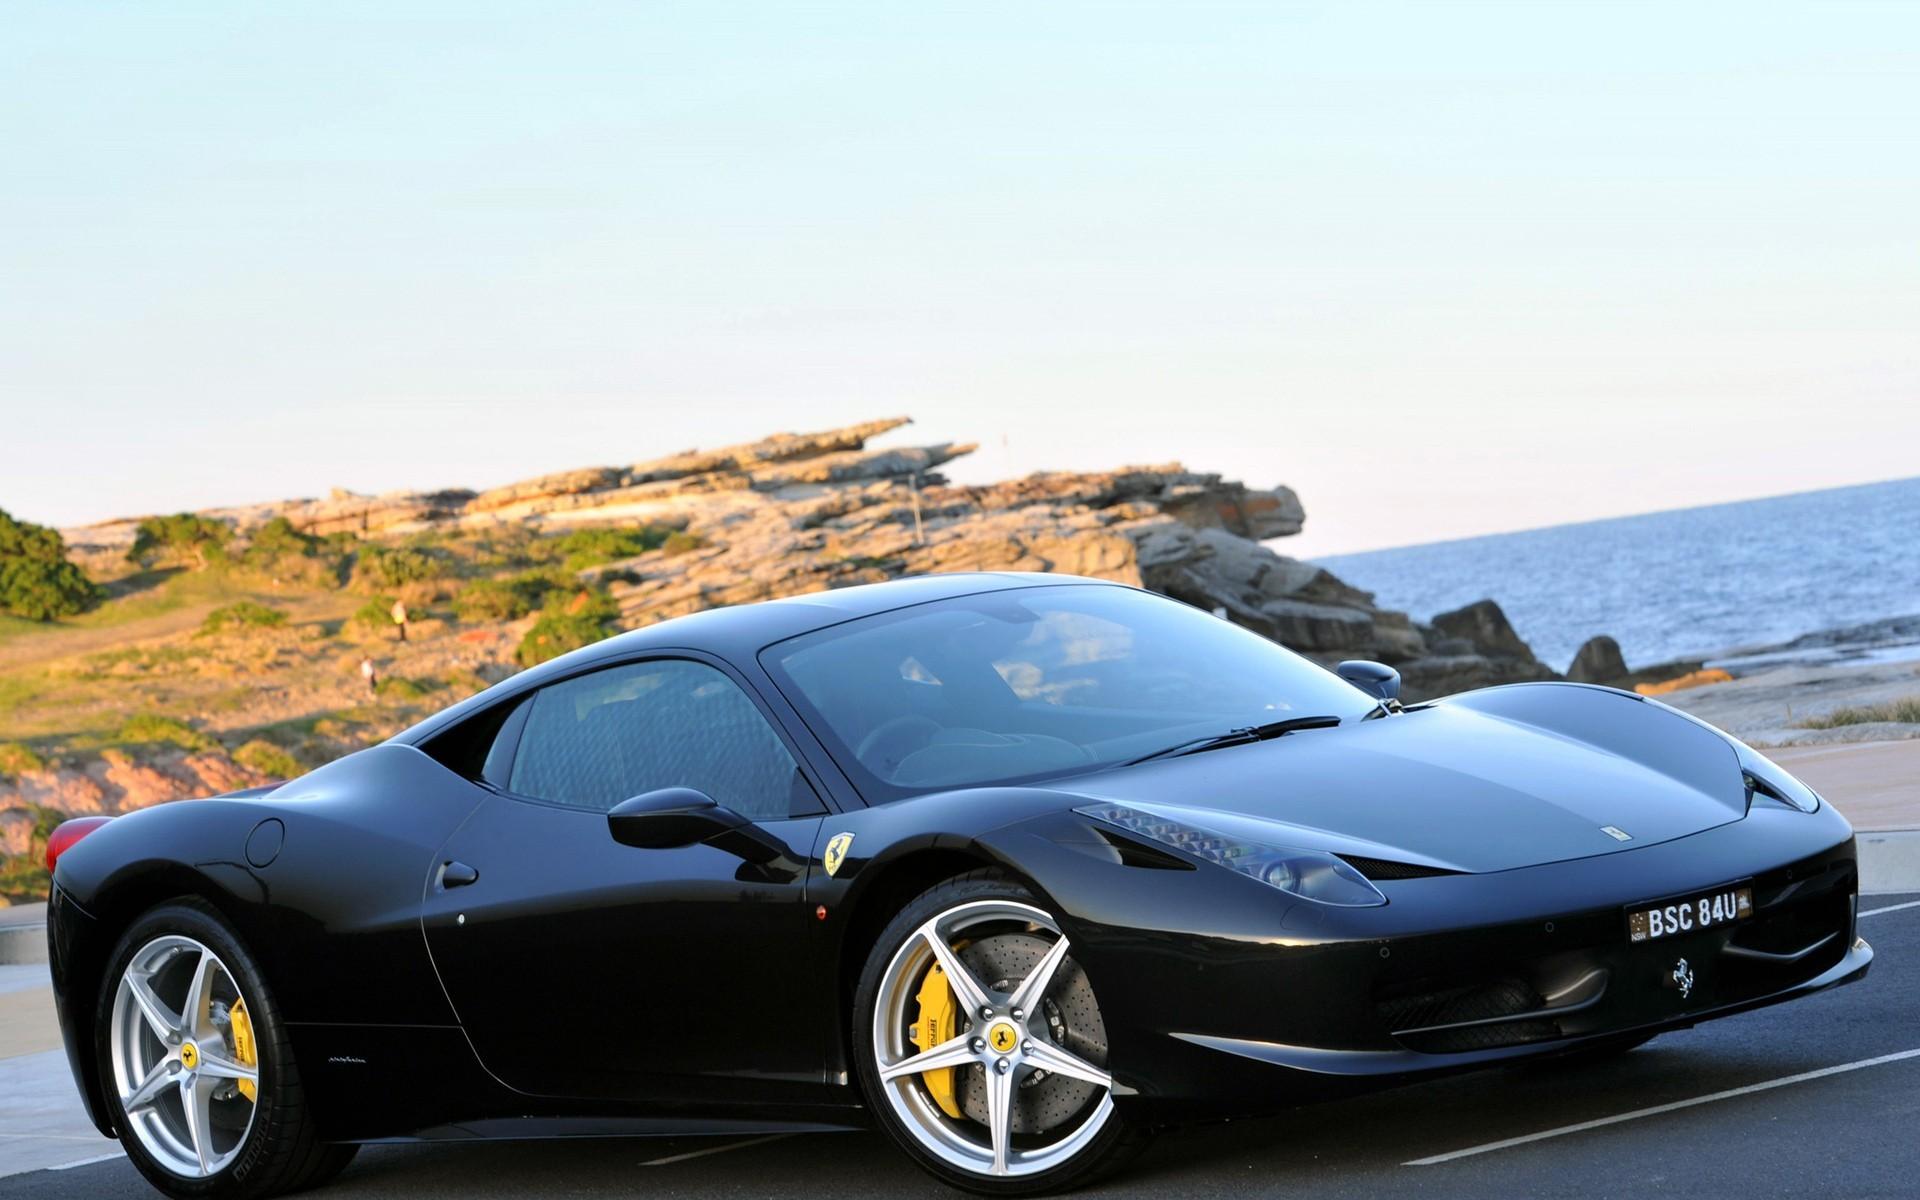 Ferrari 458 Italia wallpaper 22393 1920x1200